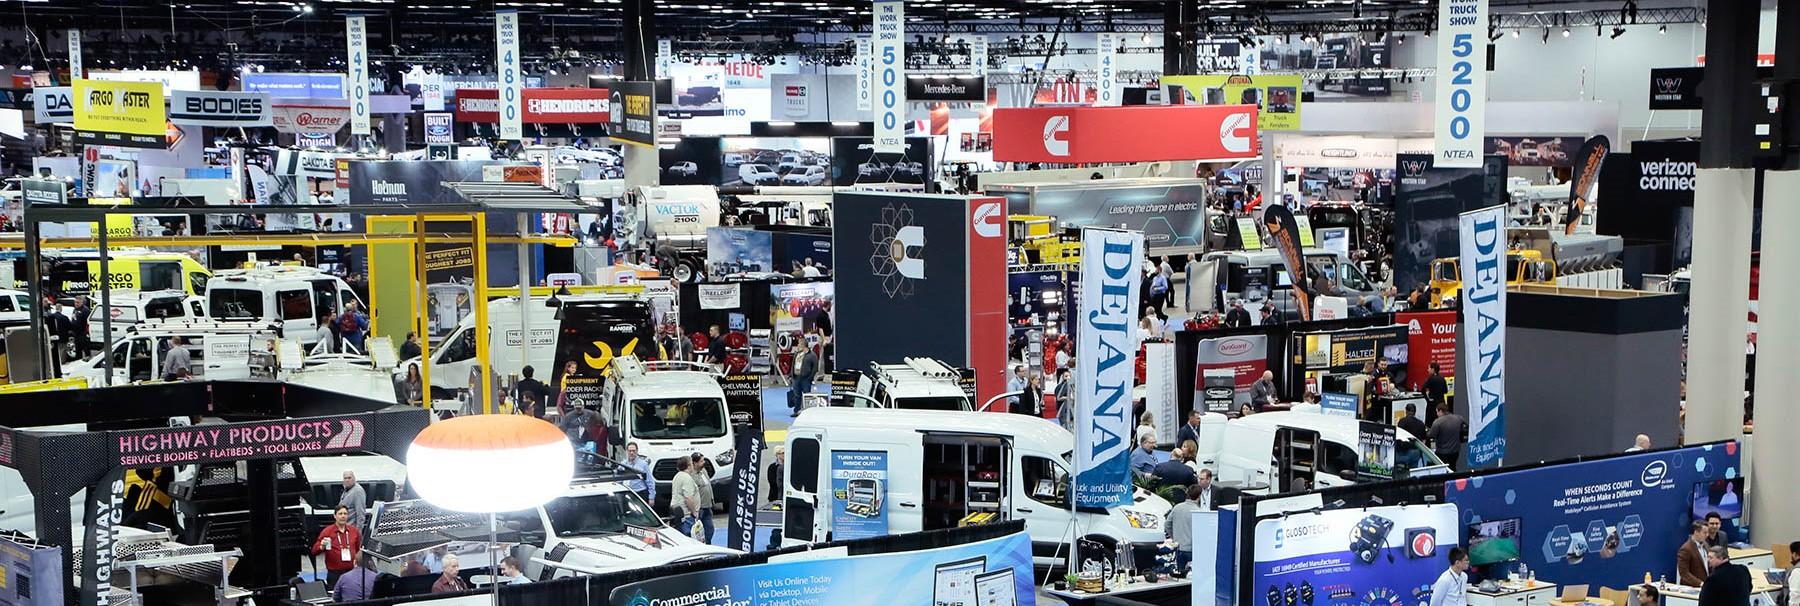 Work Truck Show 2020.Truckscience At Work Truck Show 2019 Truckscience